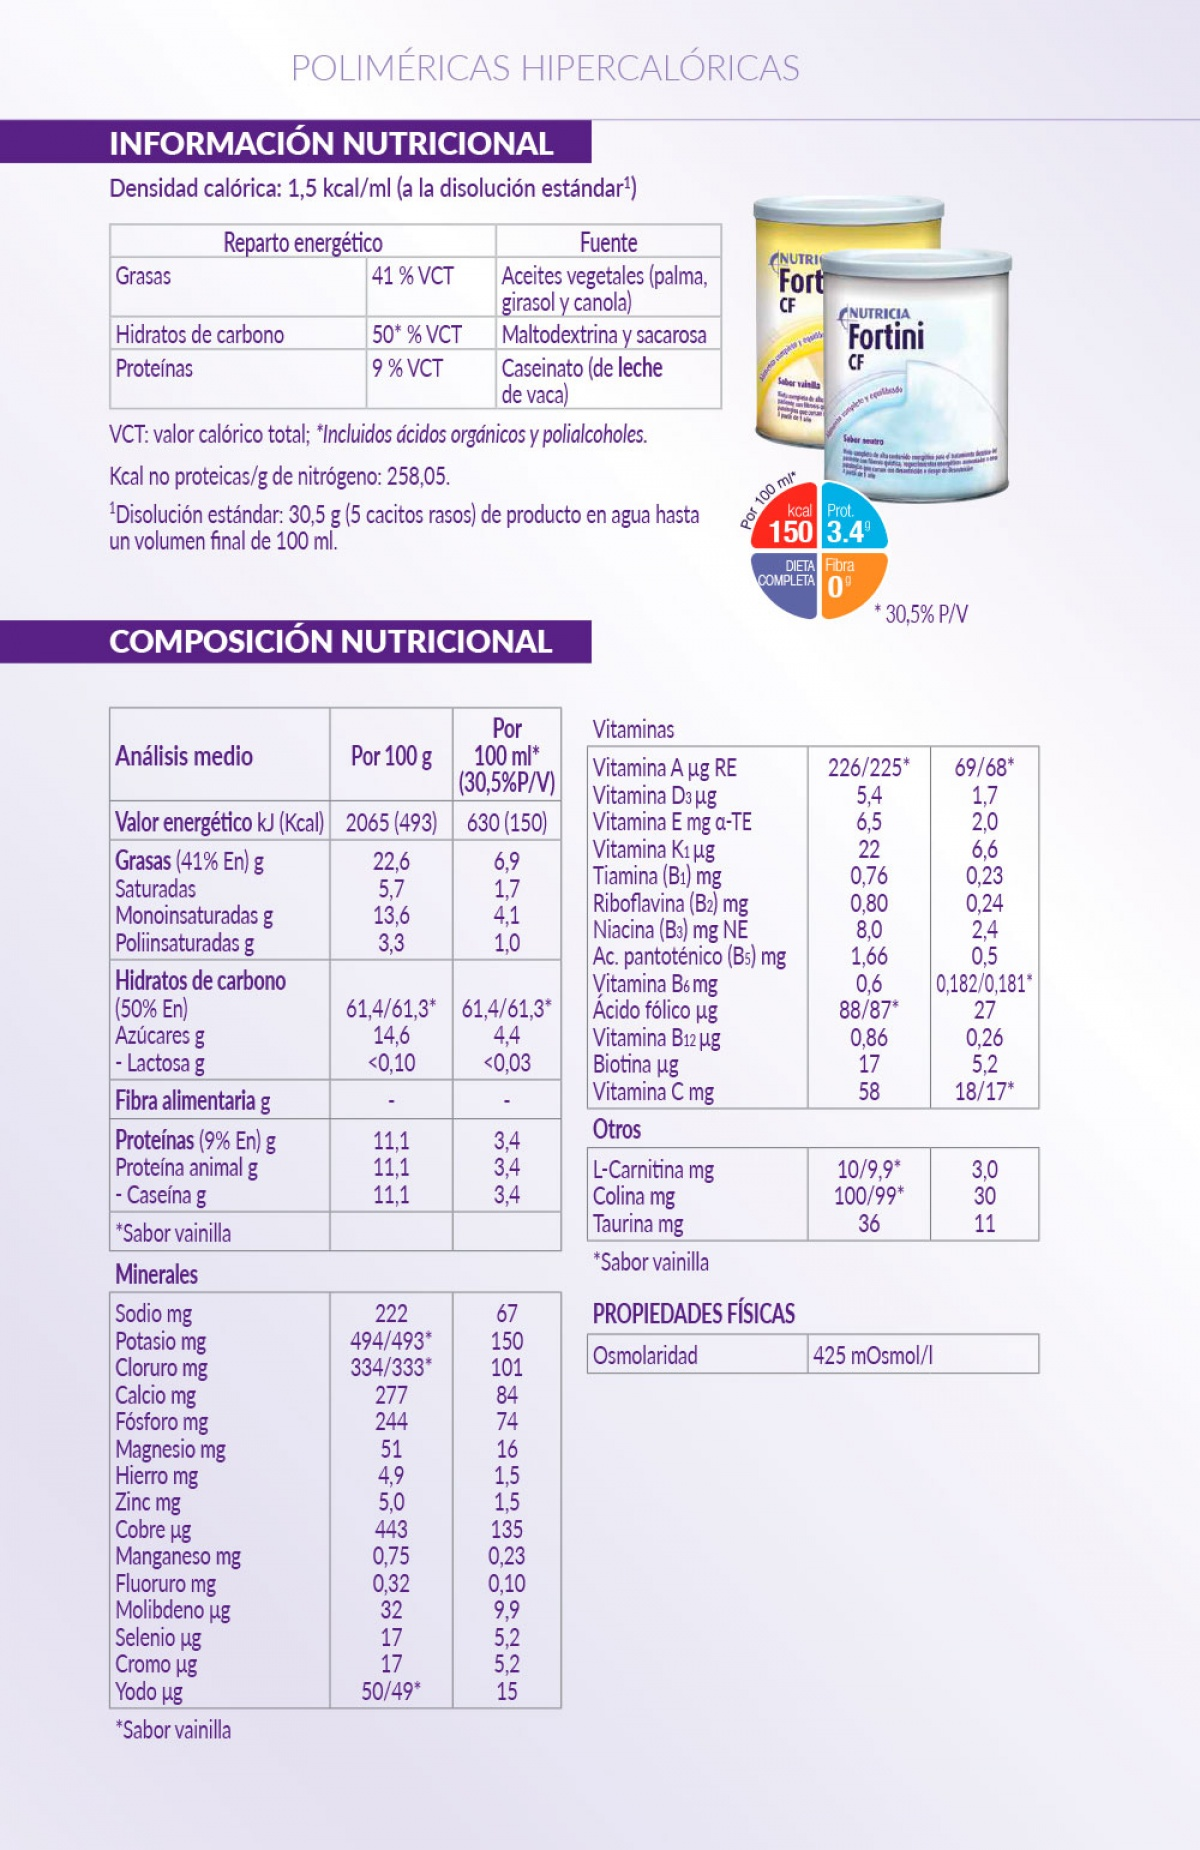 Información de Fortini CF